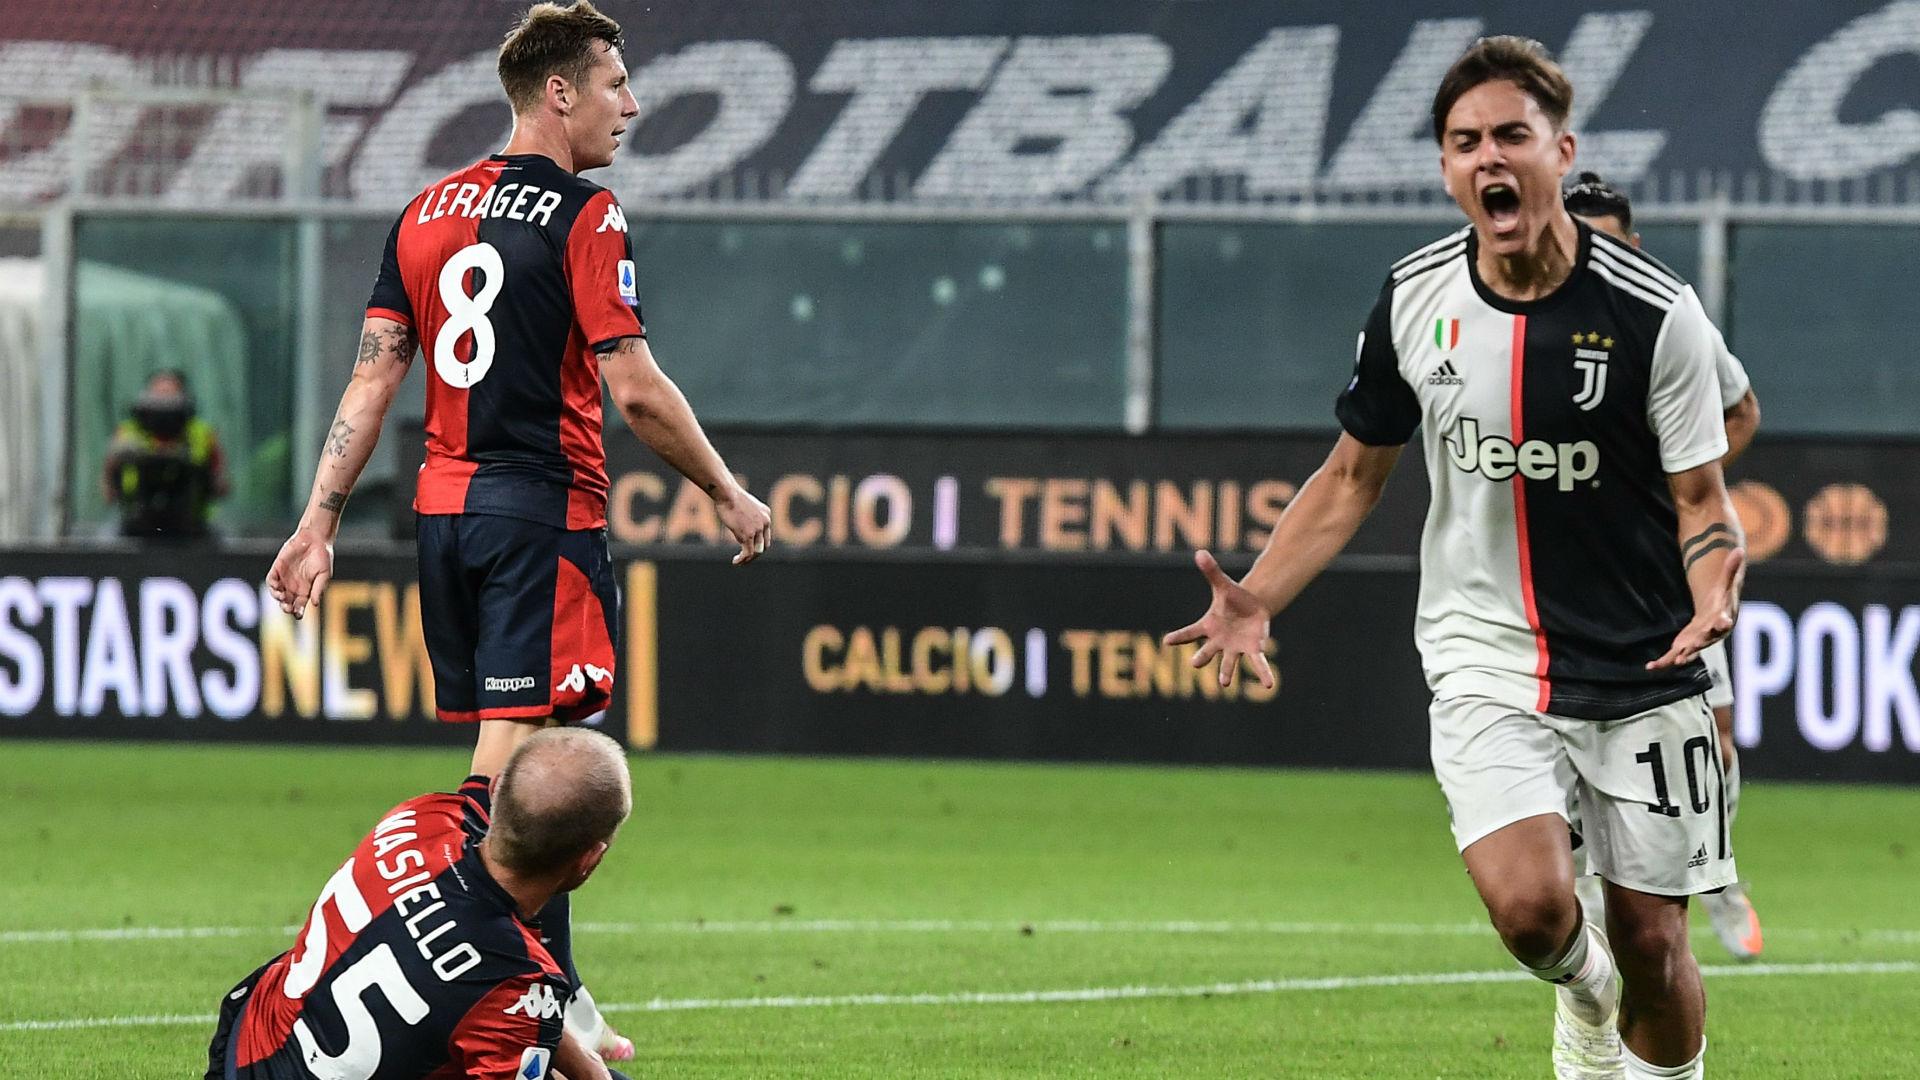 Laporan Pertandingan: Genoa vs Juventus | Goal.com